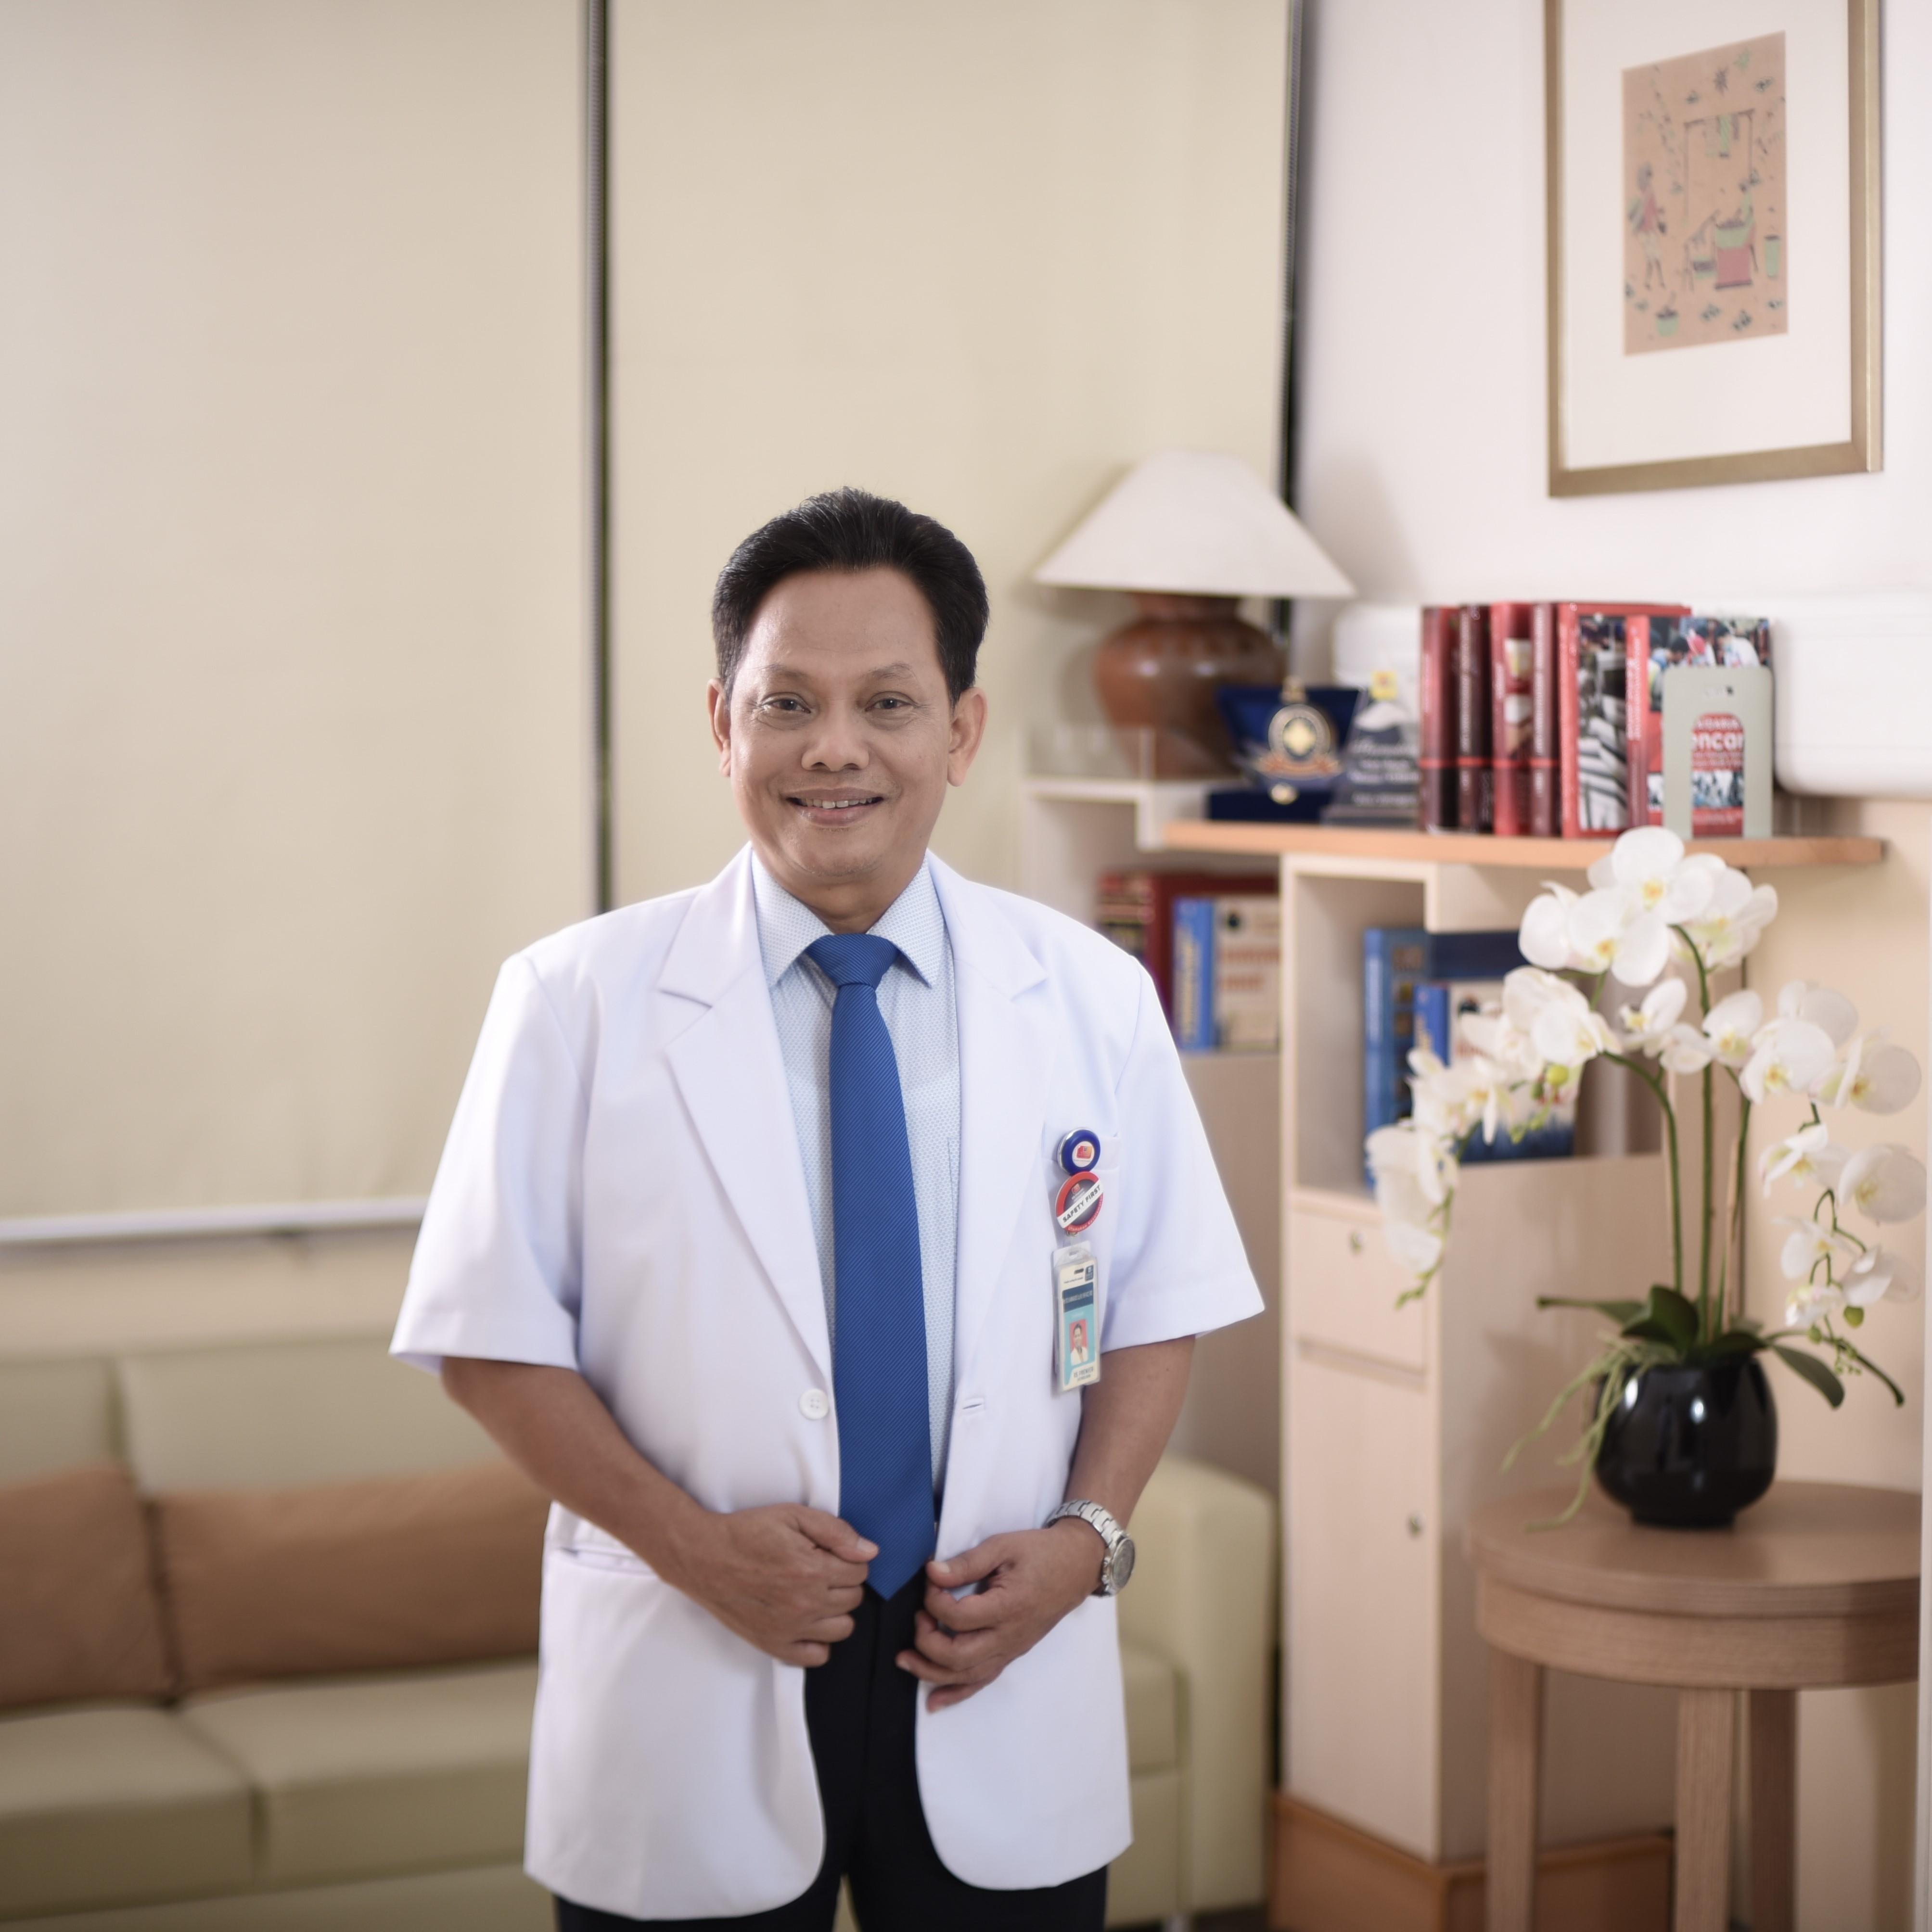 Prof. Dr. dr. Bambang Budi S, Sp.JP(K), FISHR, FAsCC, FAPSC